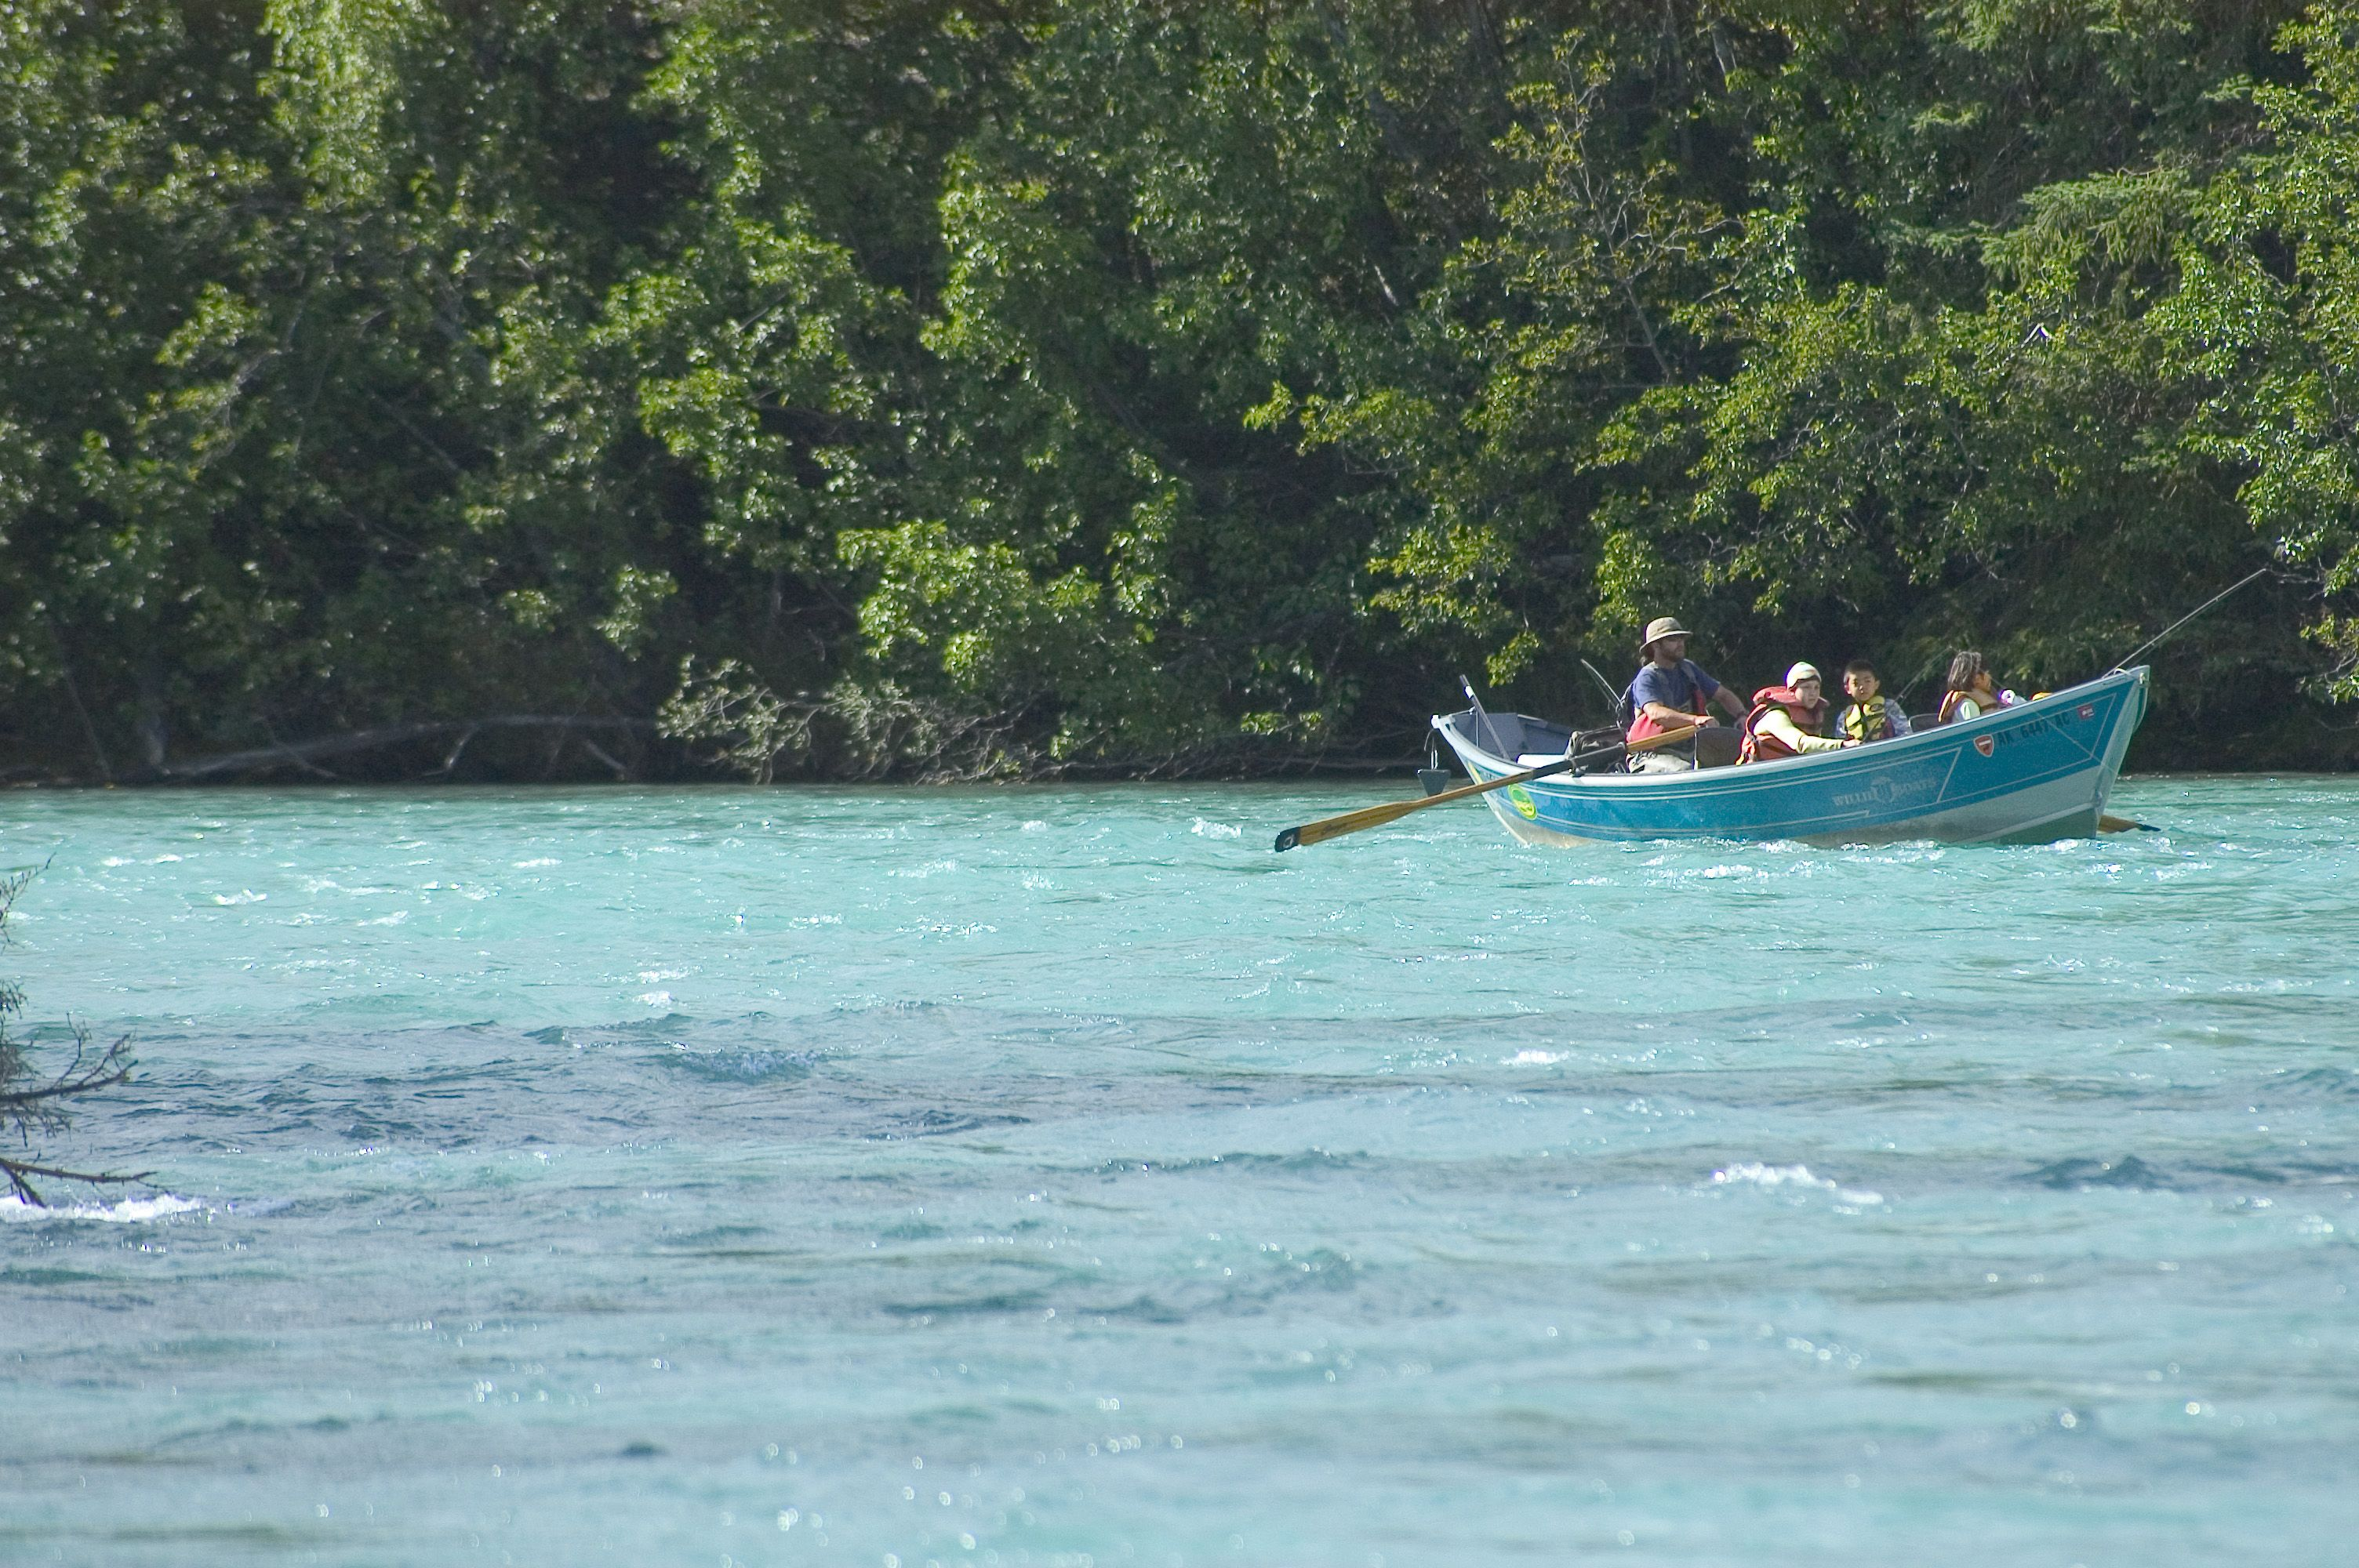 Kenai lodge activities princess lodges for Cooper landing fishing